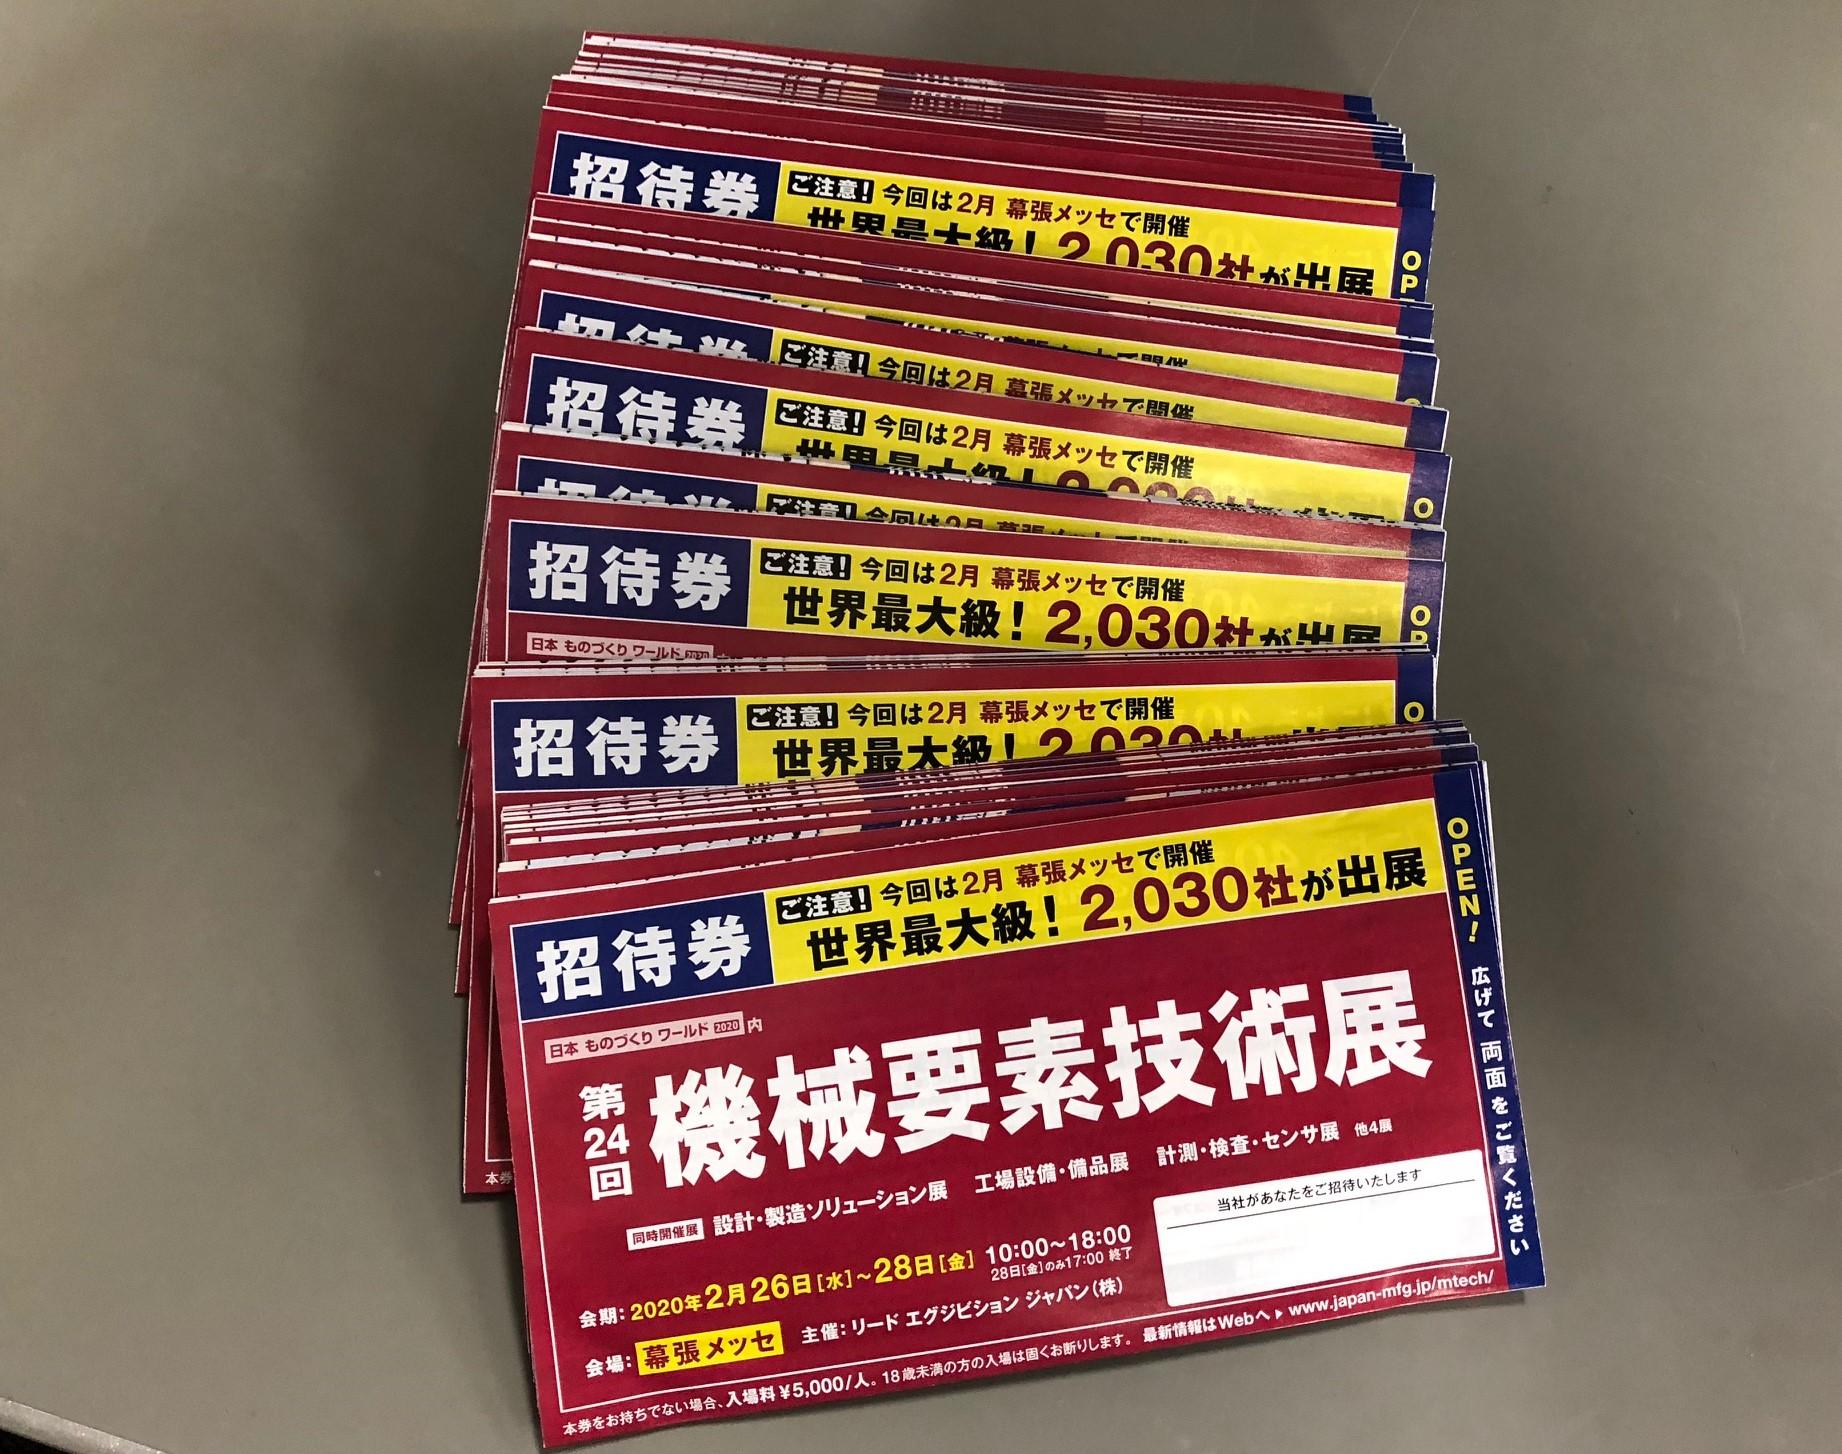 https://www.mitsumoto-bellows.co.jp/topics/IMG_8828%20%282%29.jpg